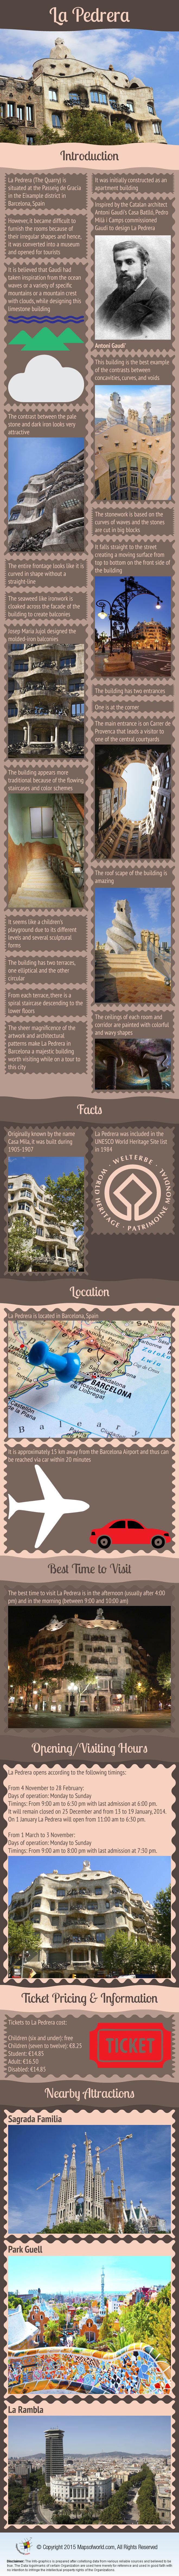 Casa Mila Infographic